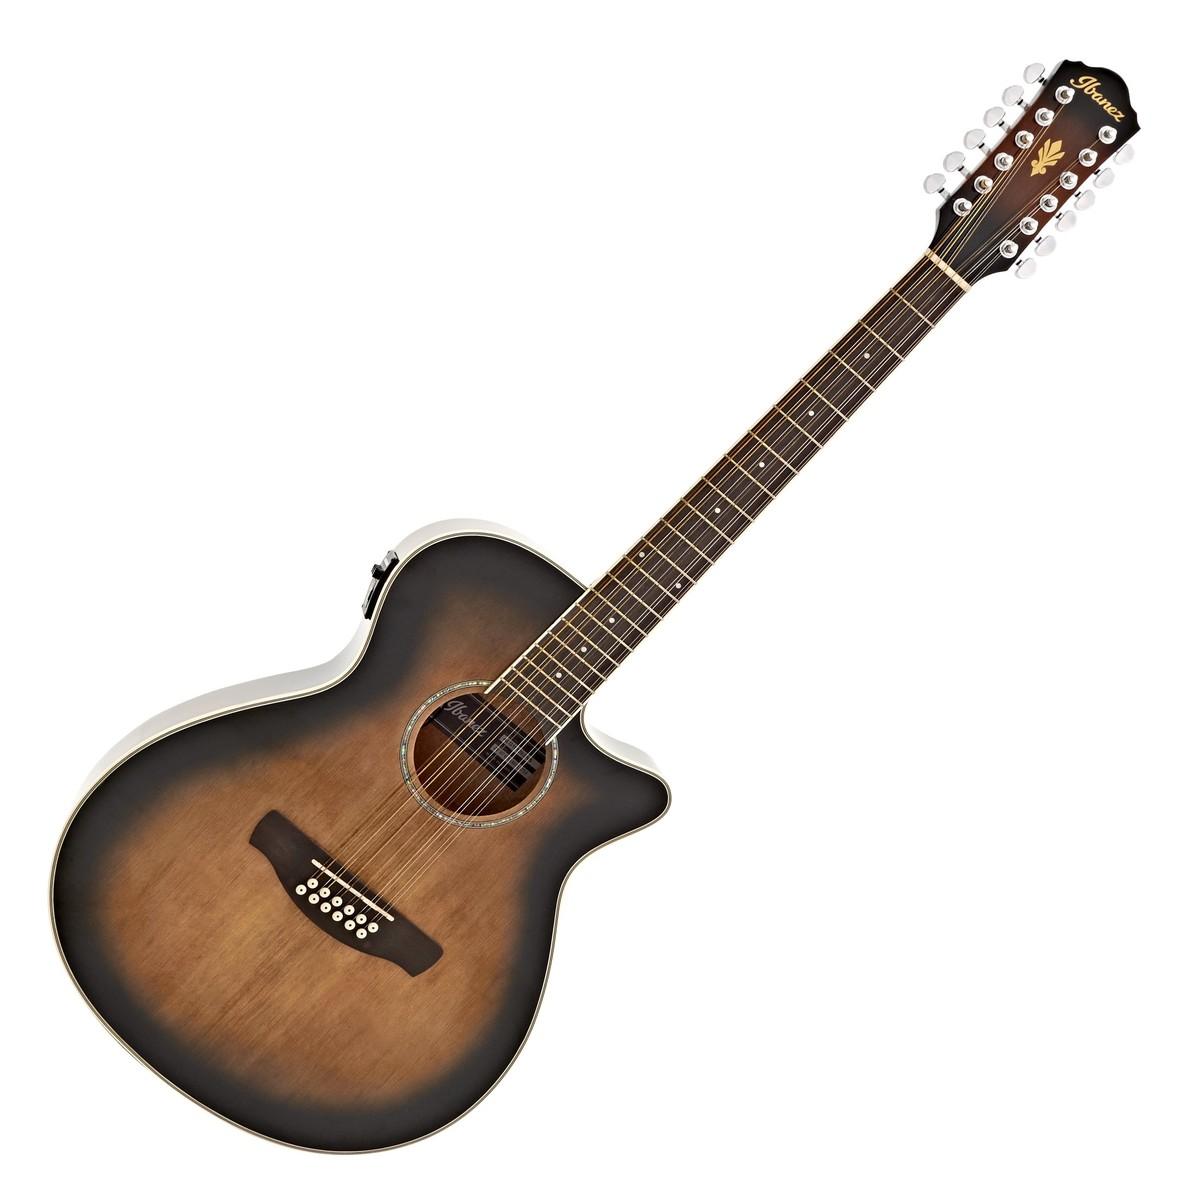 ibanez aeg1812ii 12 string electro acoustic 2018 violin sunburst at gear4music. Black Bedroom Furniture Sets. Home Design Ideas